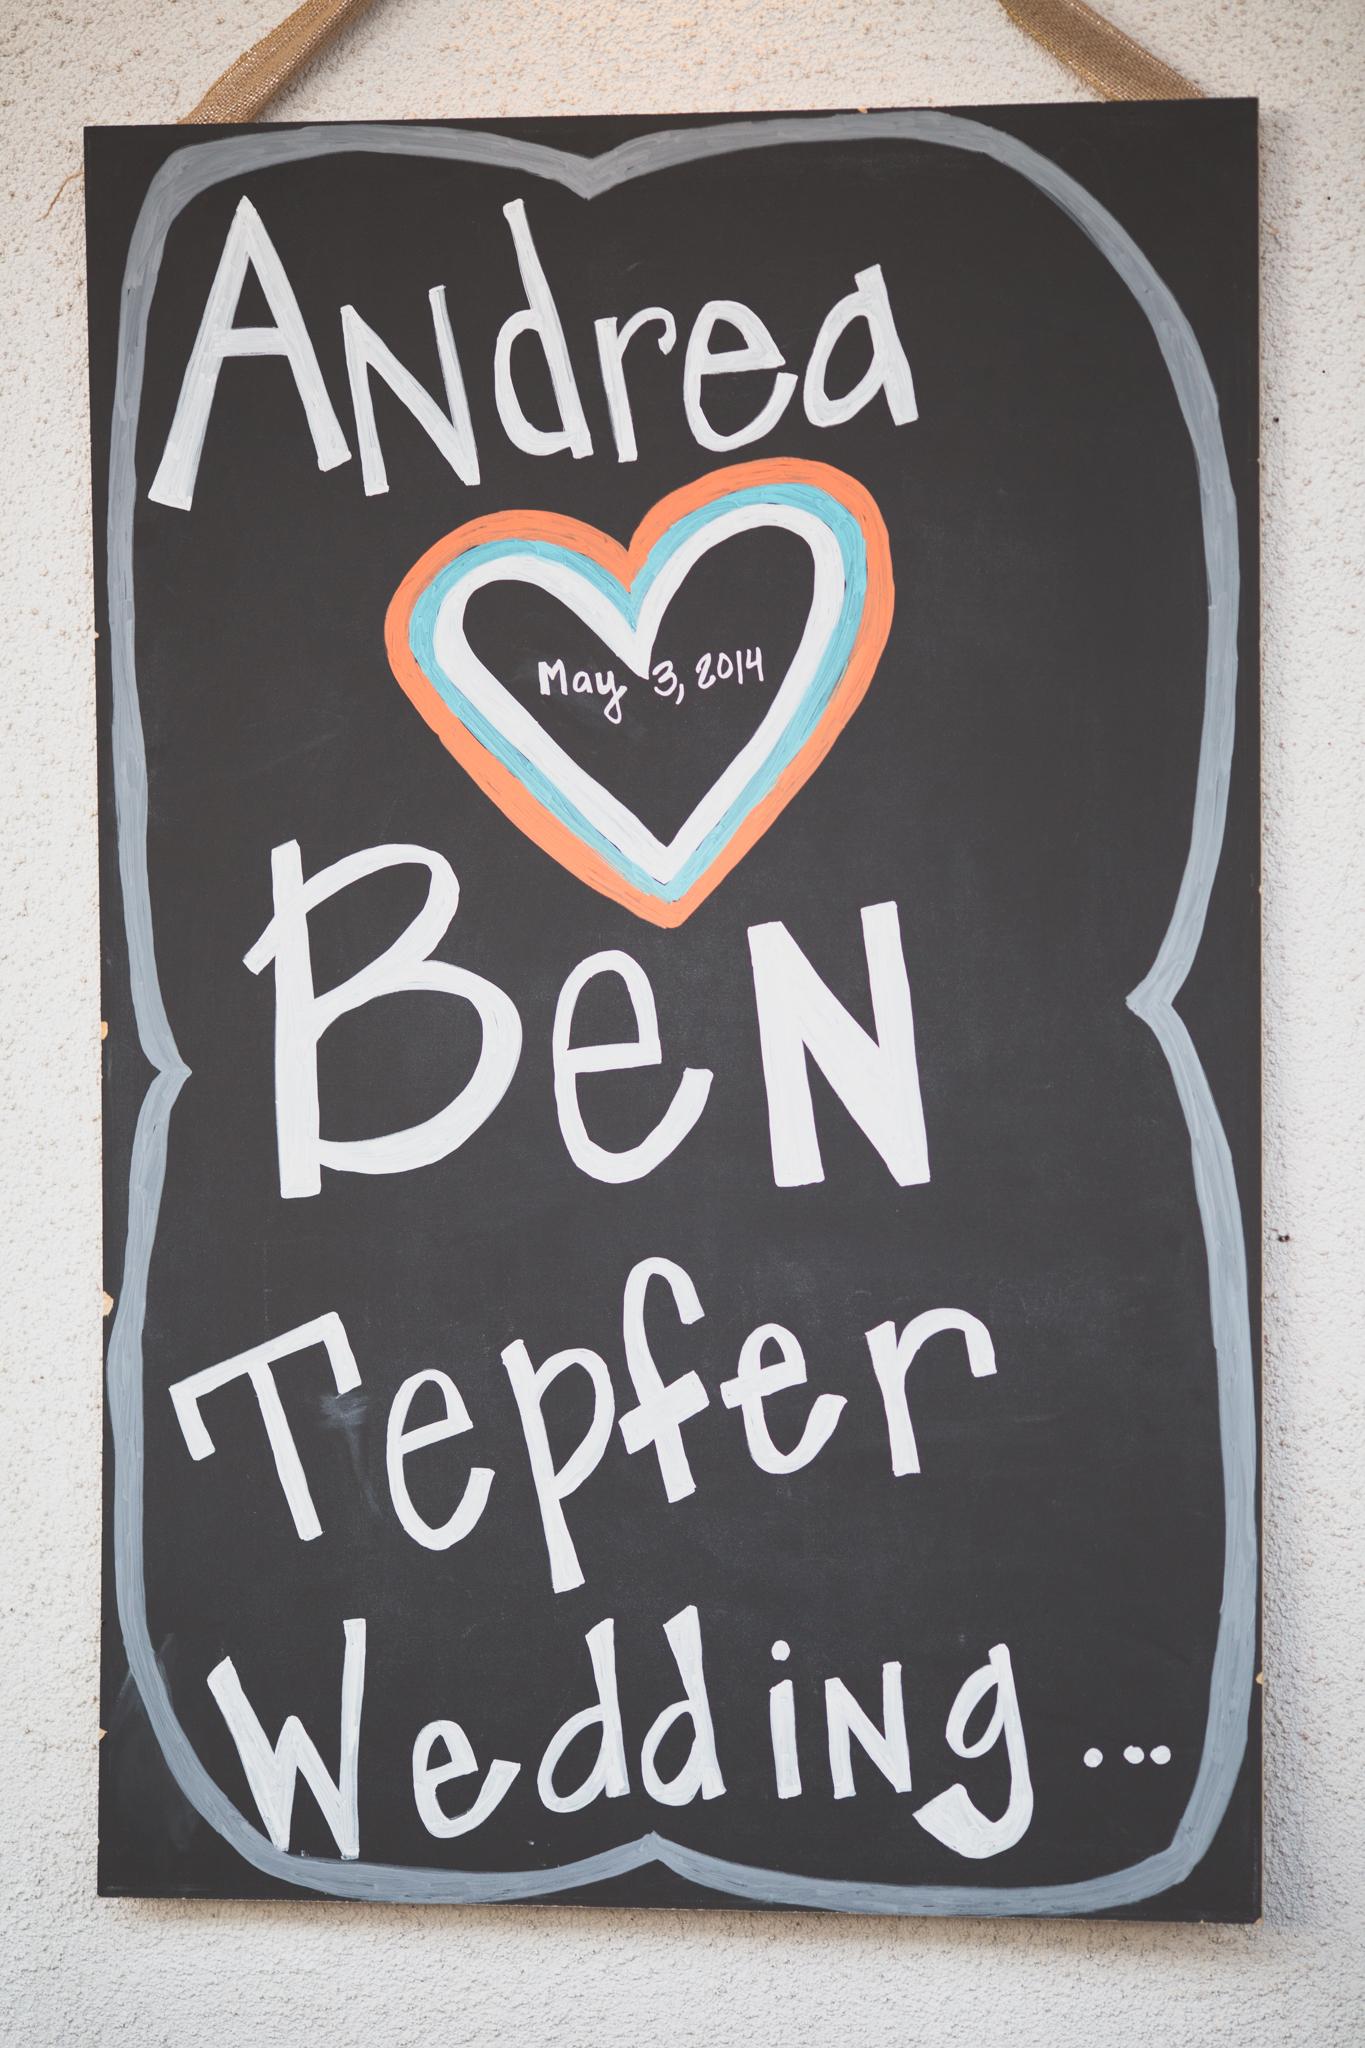 scottsdale-wedding-photographer-el-dorado-ben-and-andrea